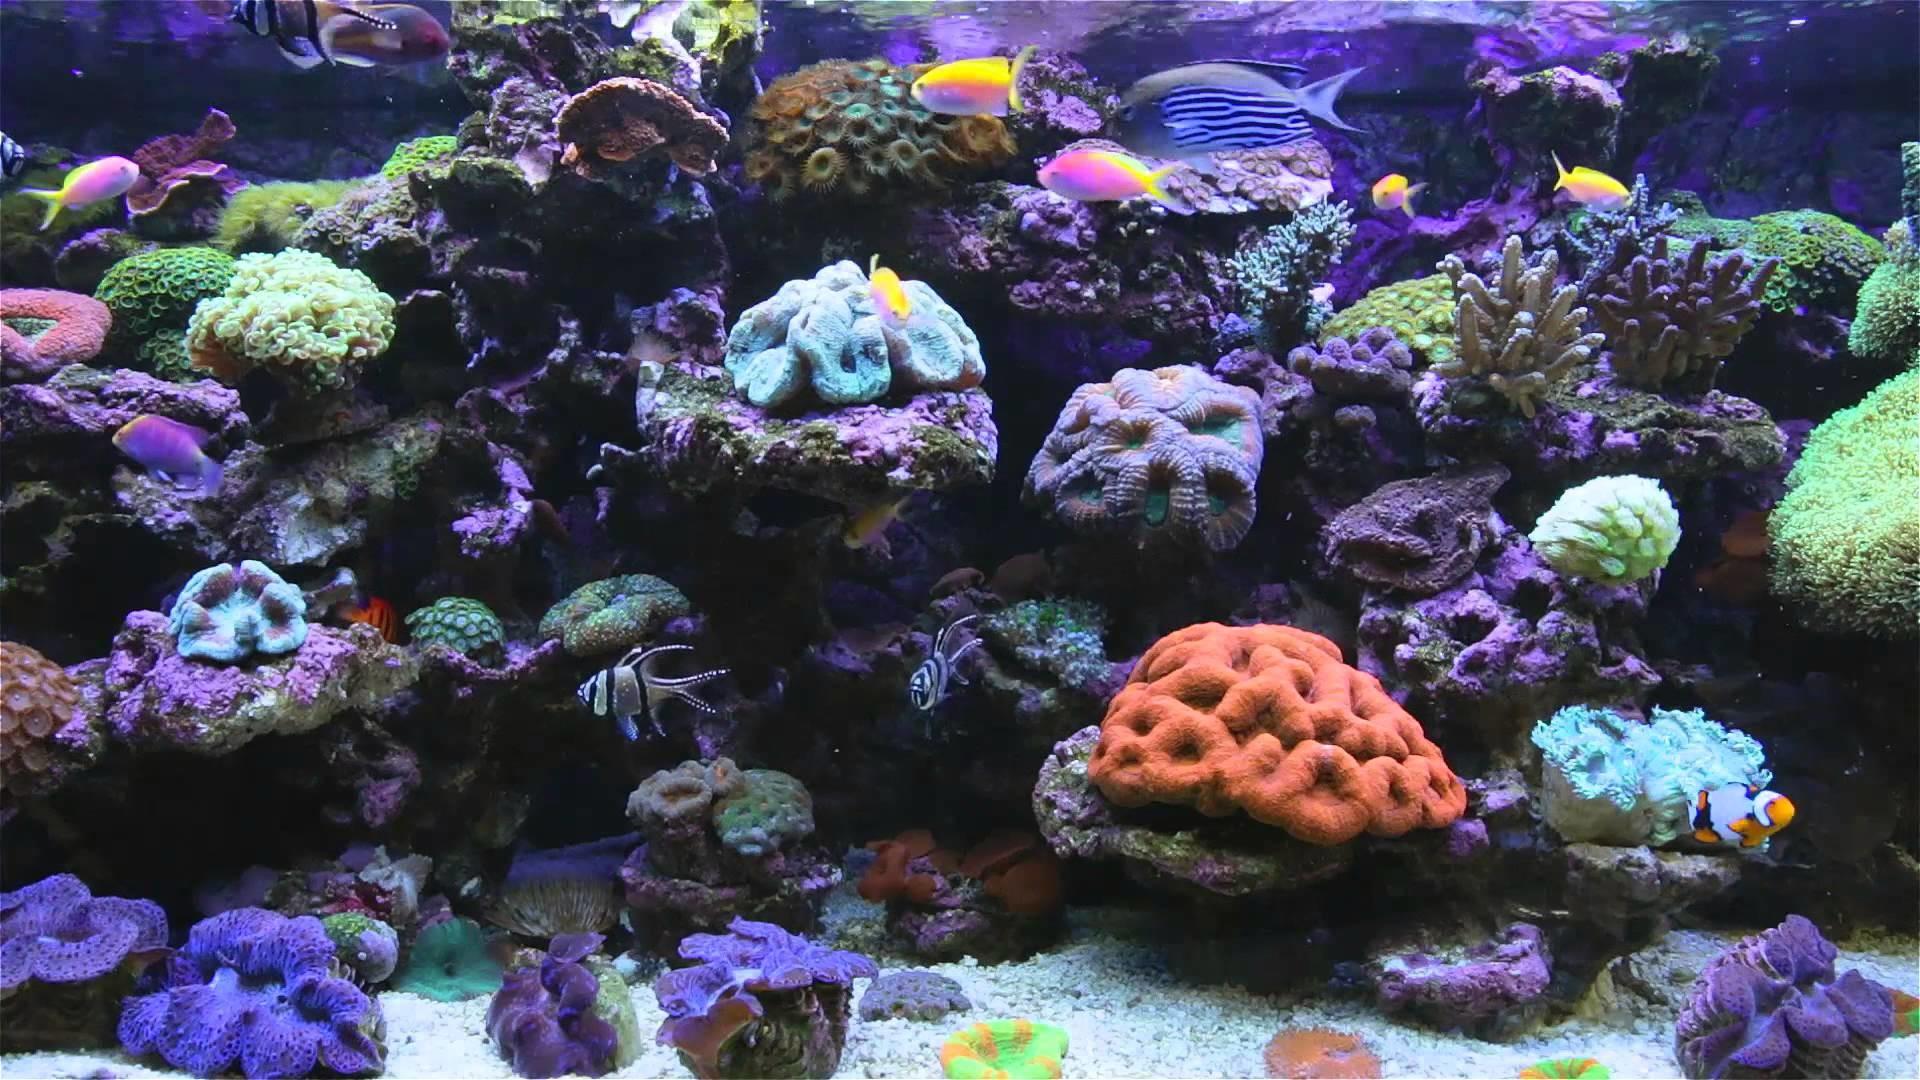 Aquarium backgrounds download free pixelstalk.net